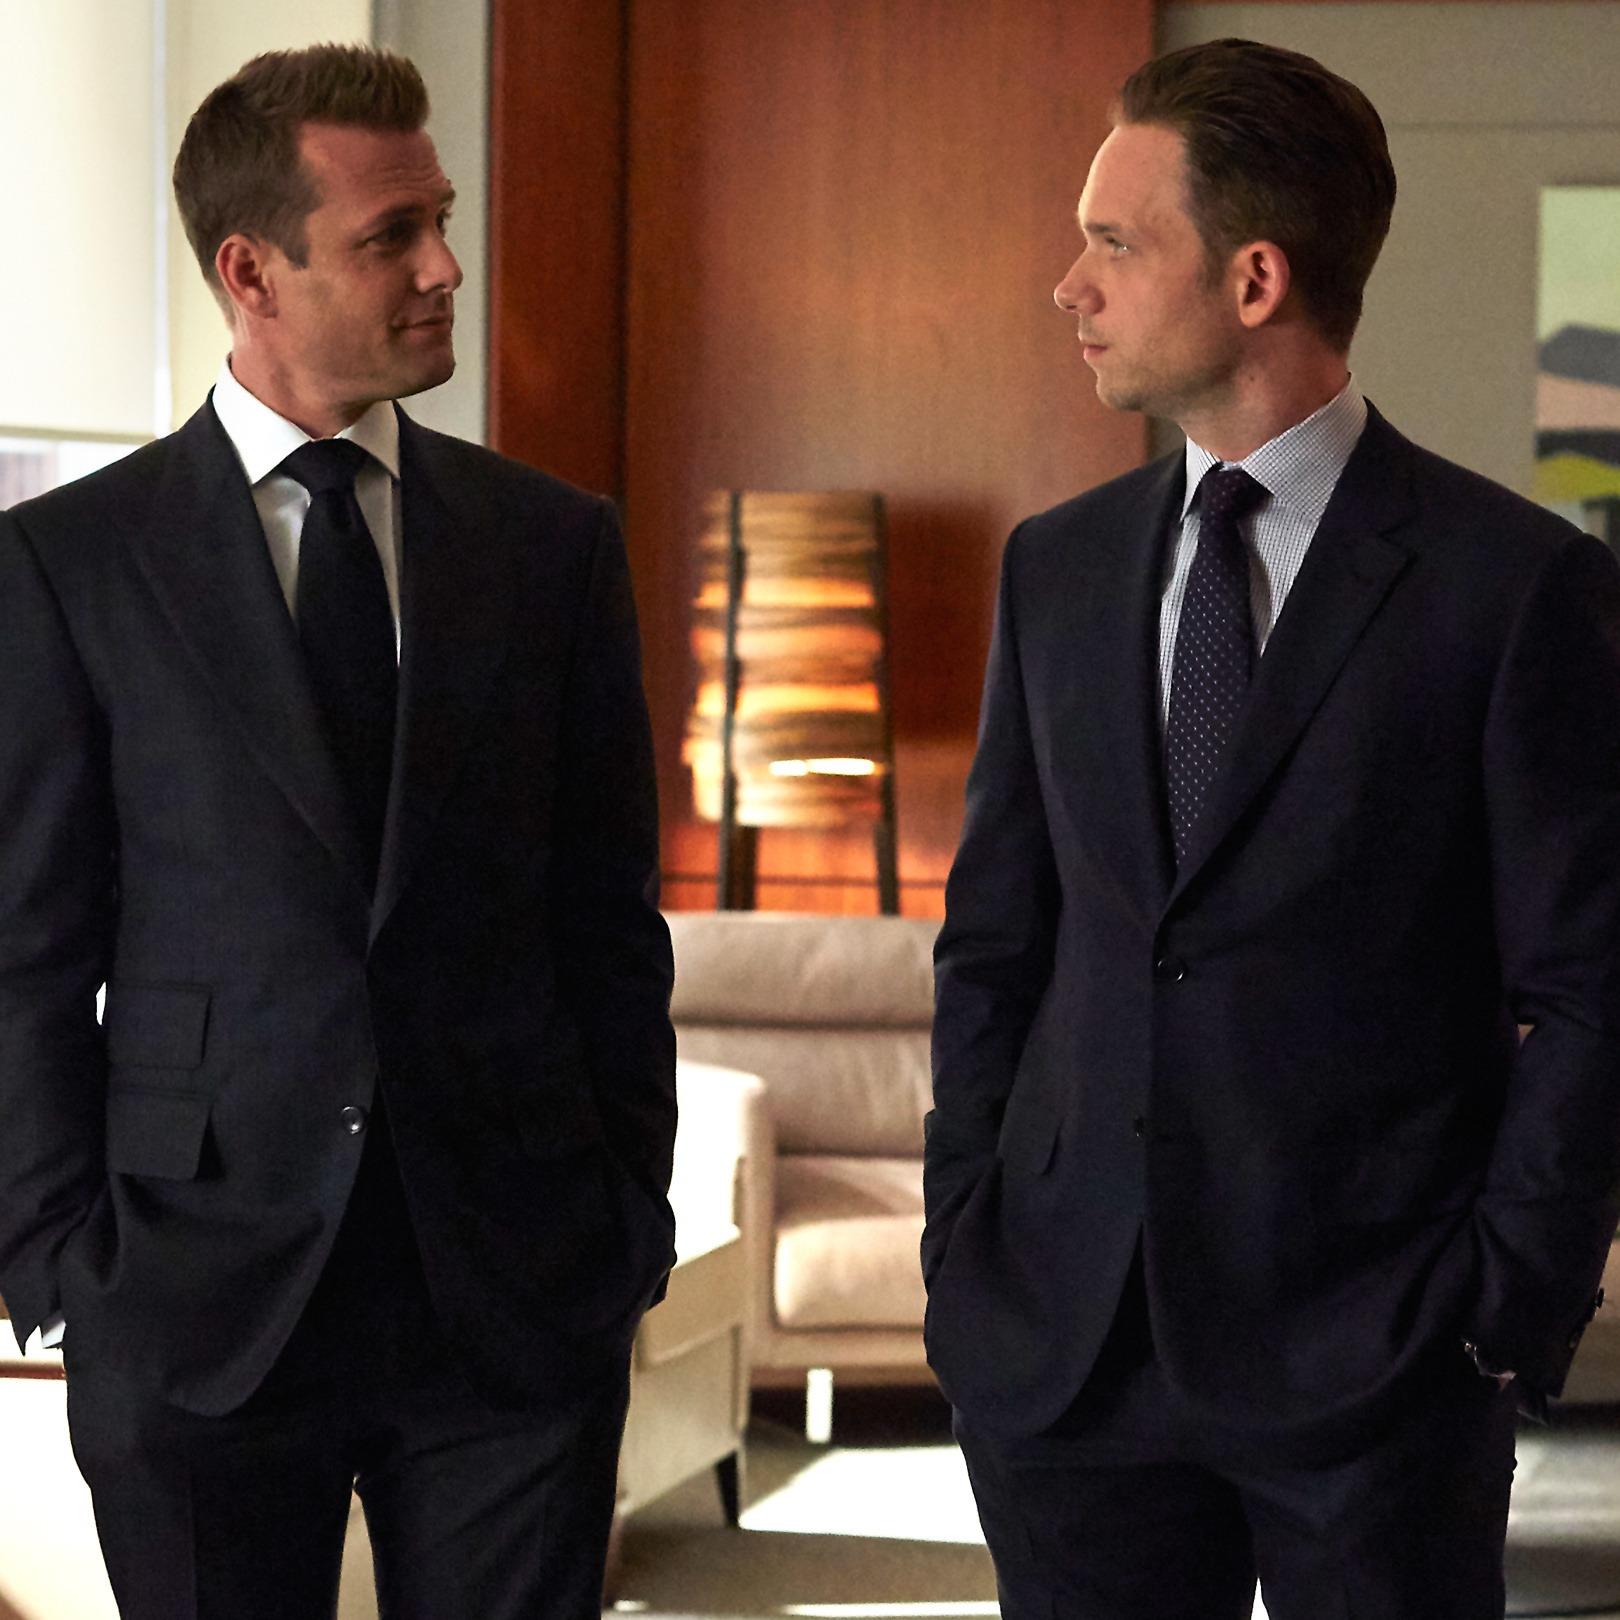 Sen de herkes gibisin Harvey!